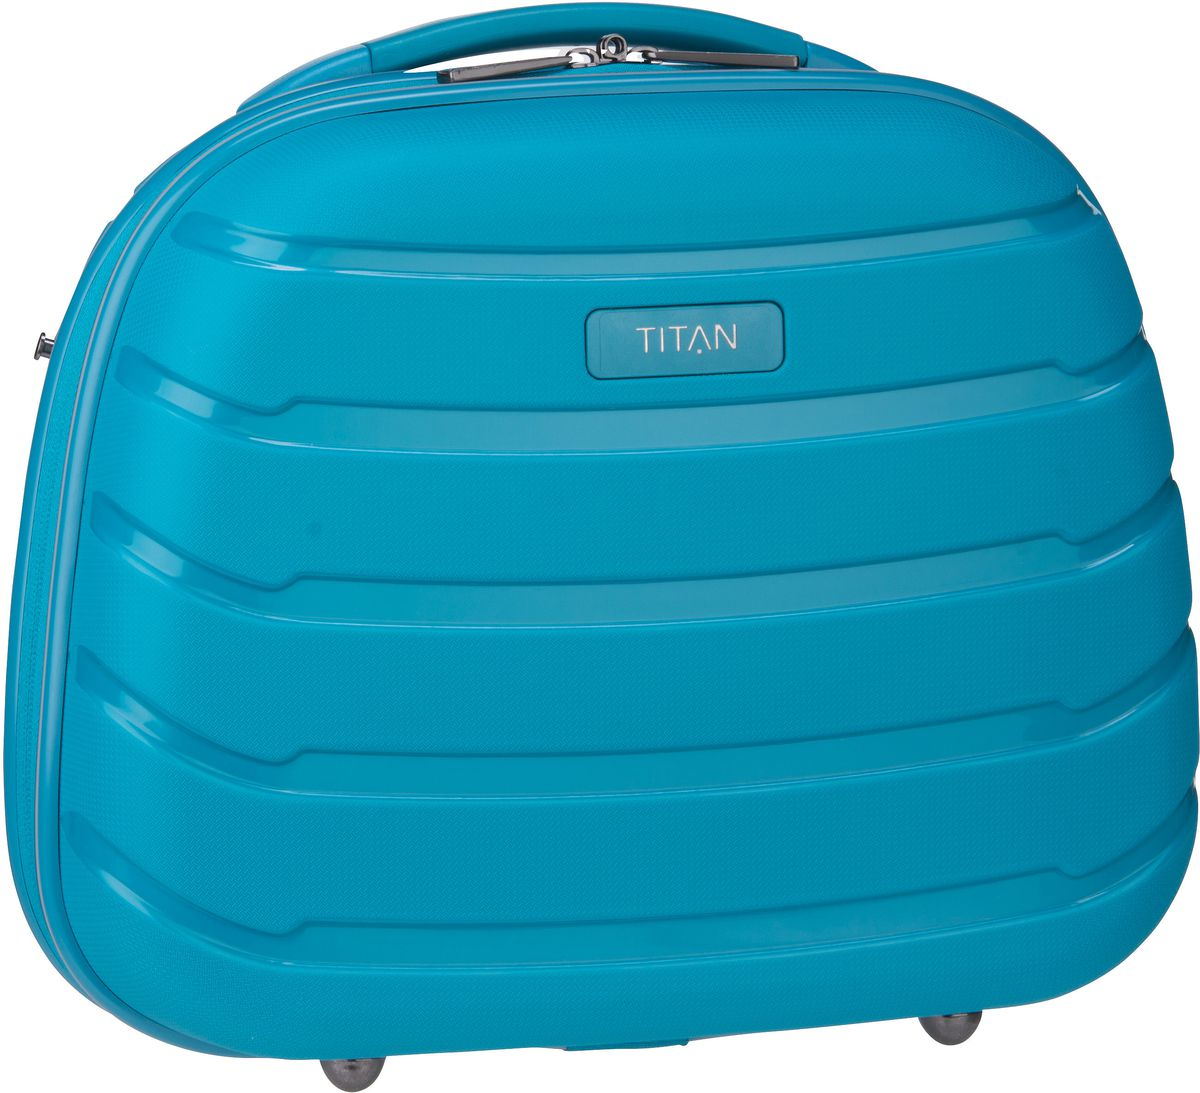 Titan Limit Beautycase Aqua Blue - Kulturbeutel / Beauty Case